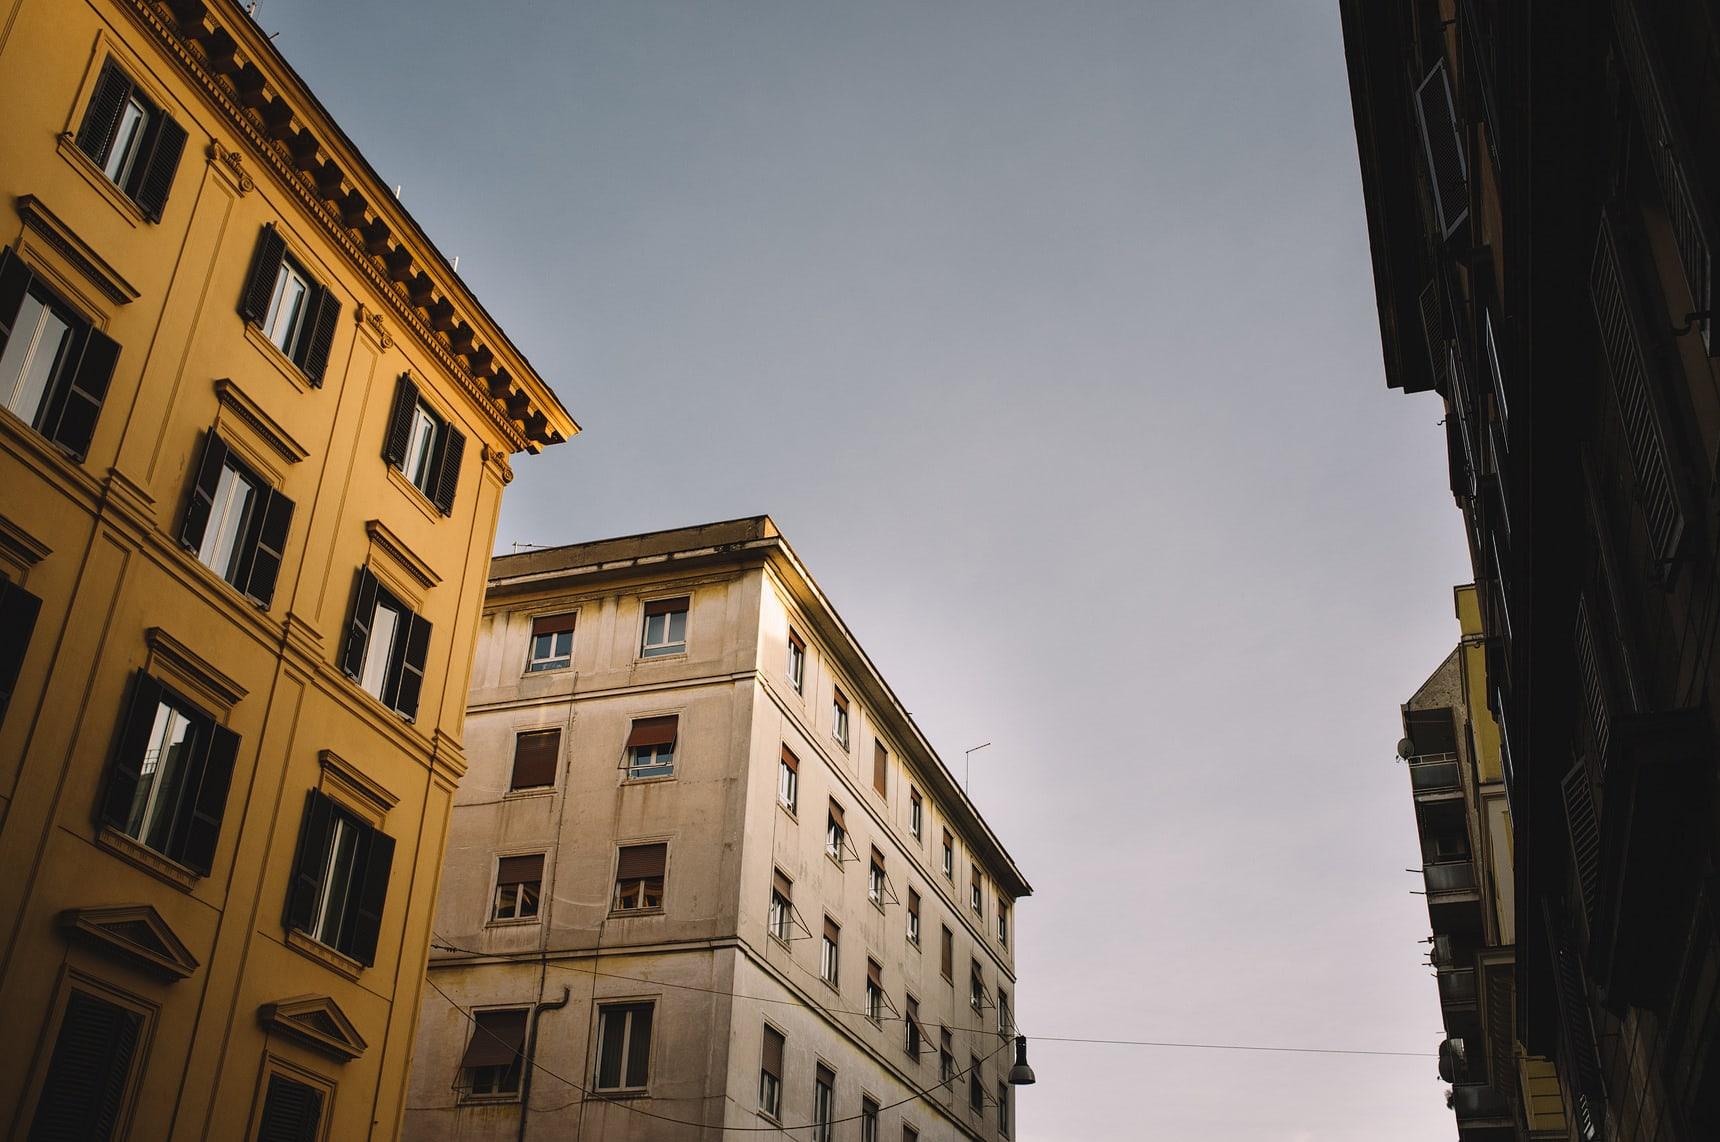 wedding photographer shooting street in rome italy